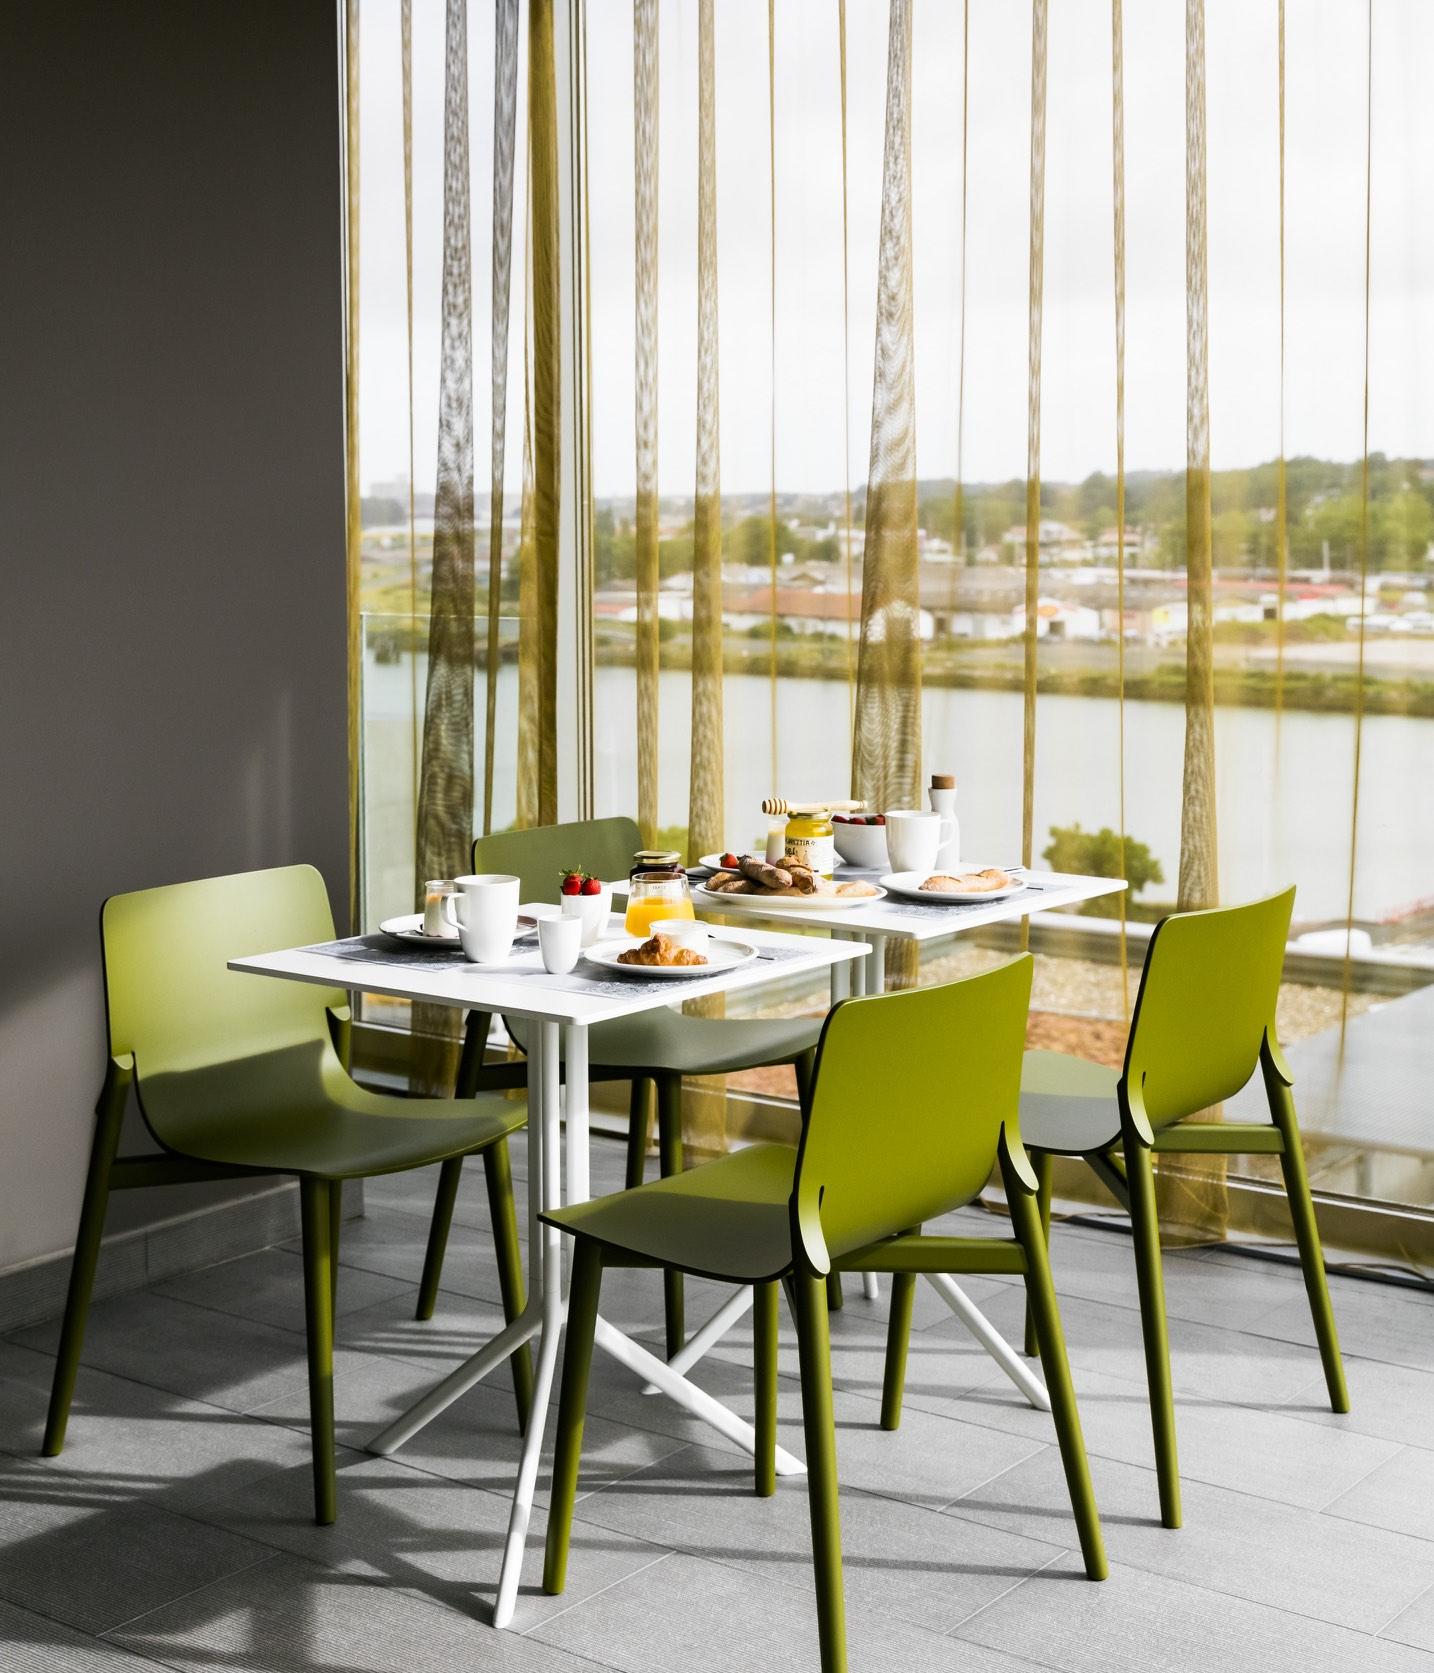 h tels okko bayonne travel style life. Black Bedroom Furniture Sets. Home Design Ideas